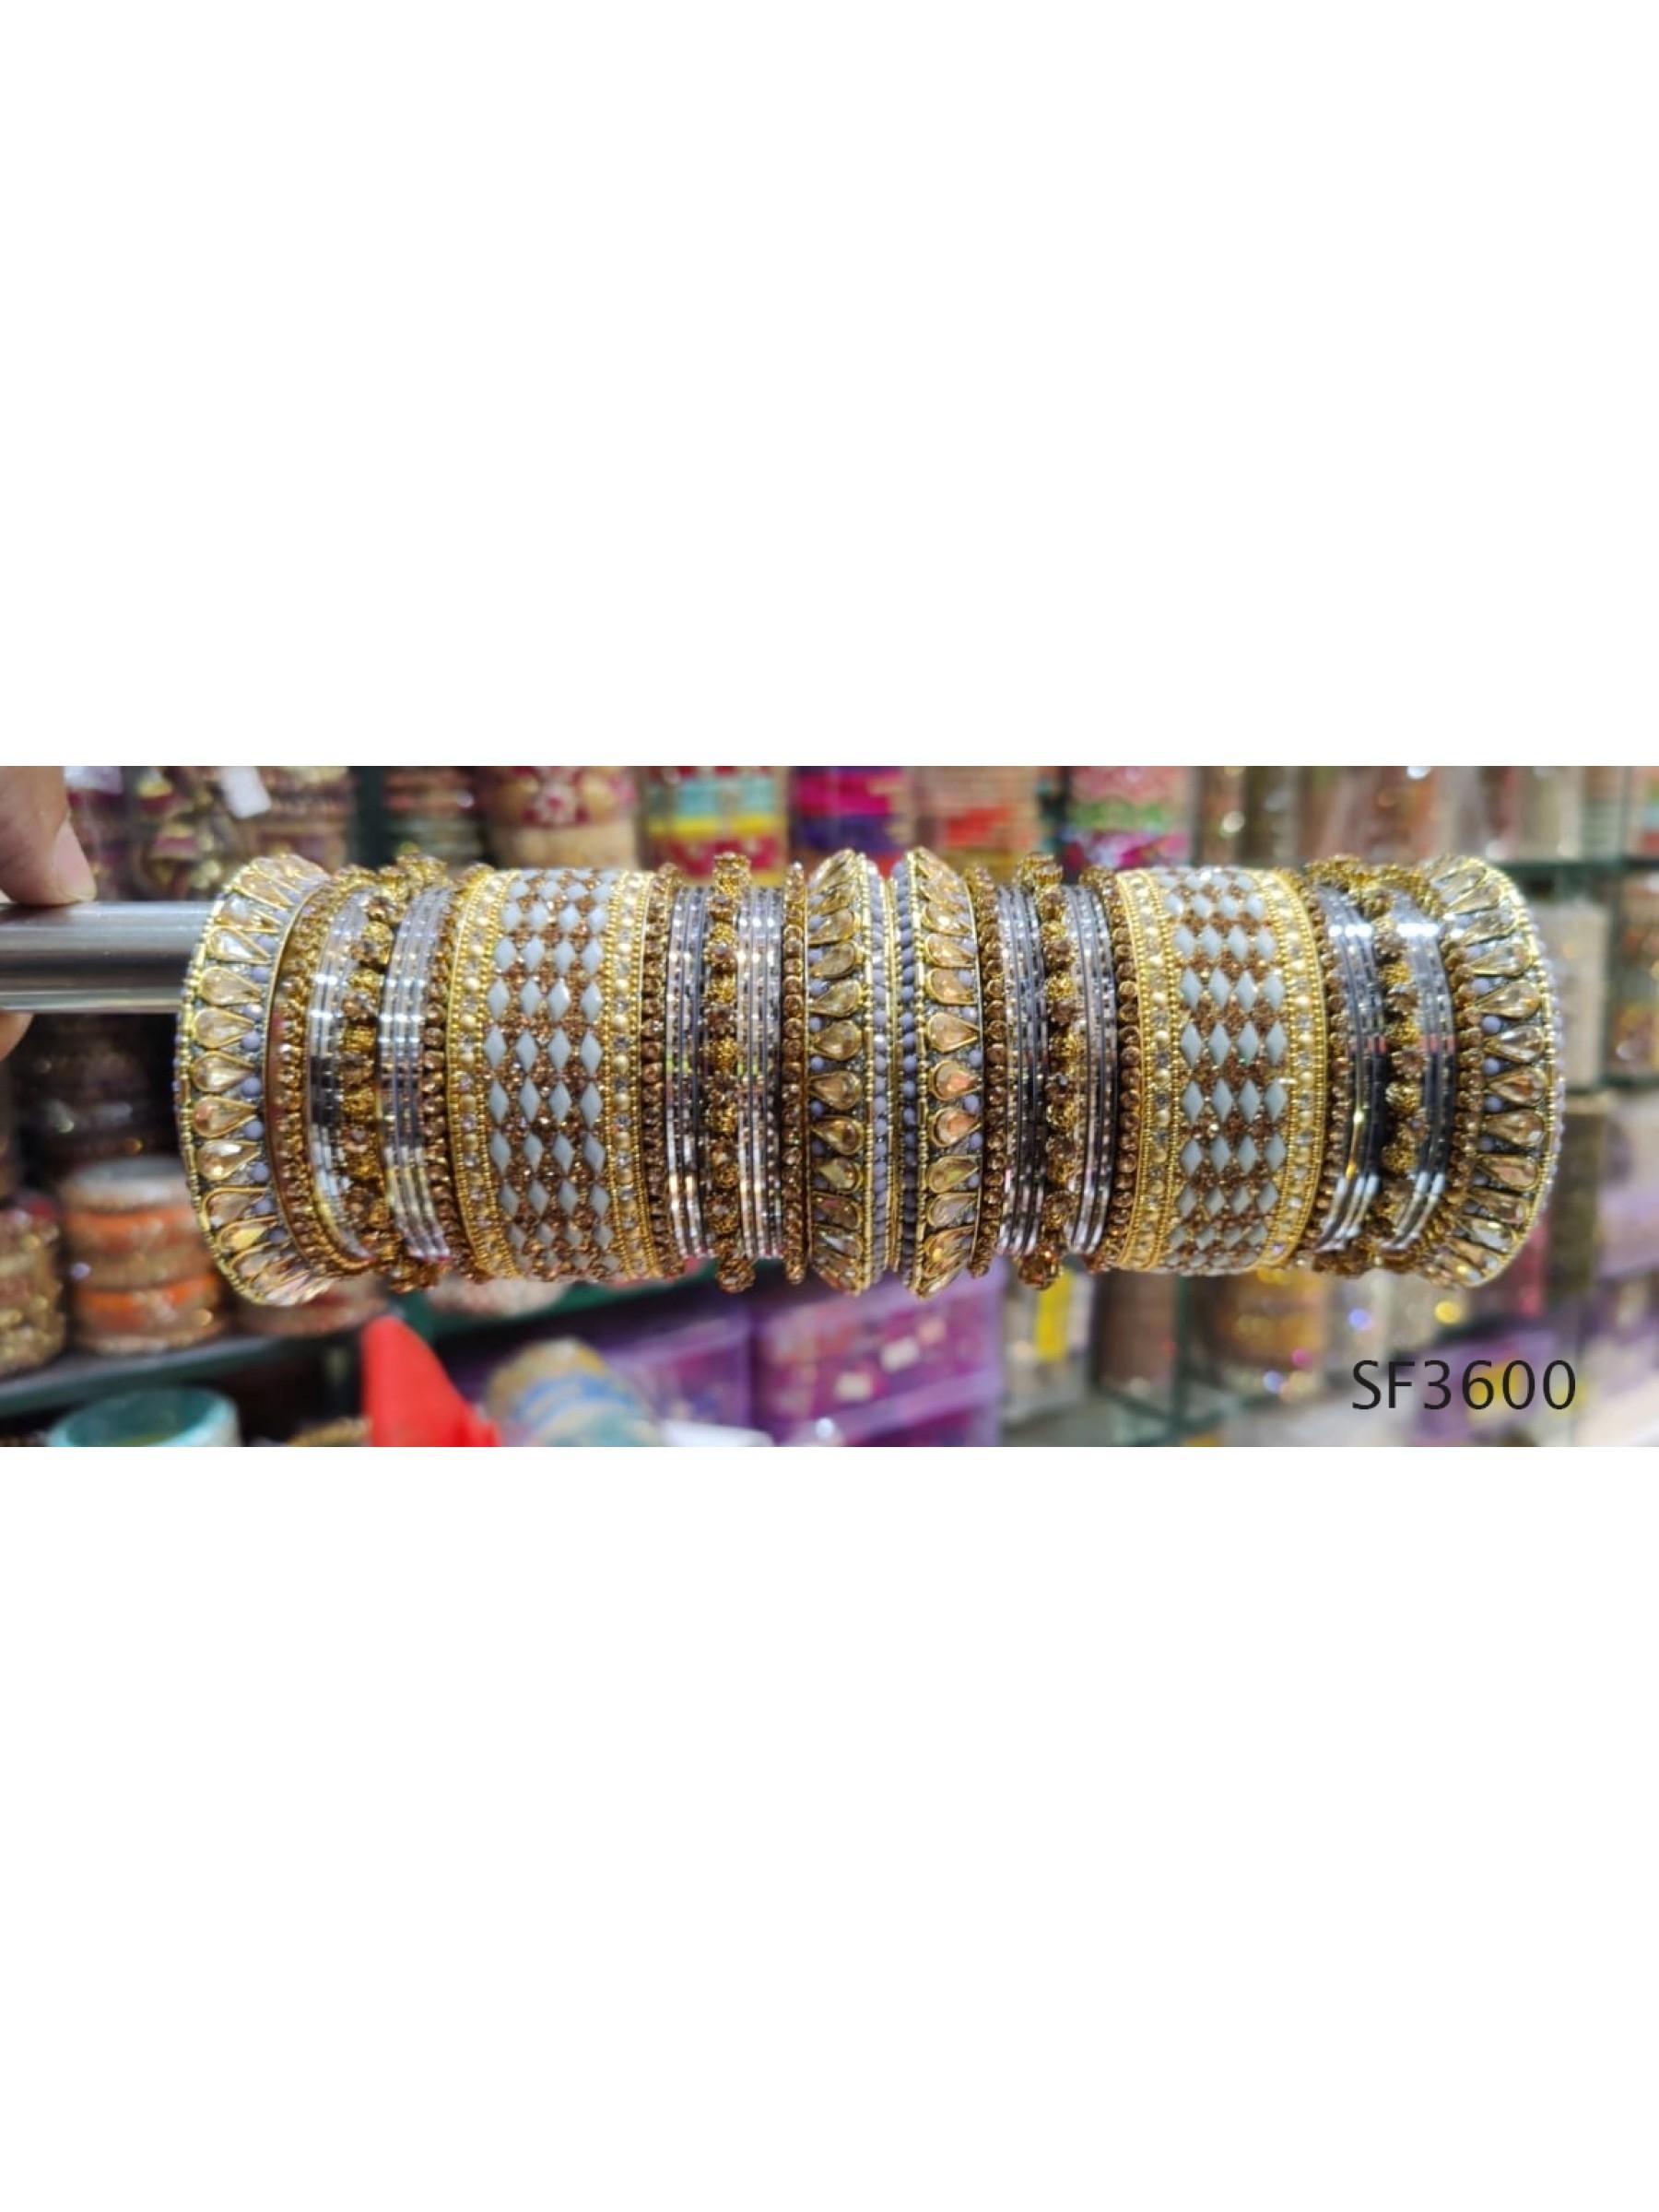 Golden & Grey Color Bridal Bangles With White Diamond